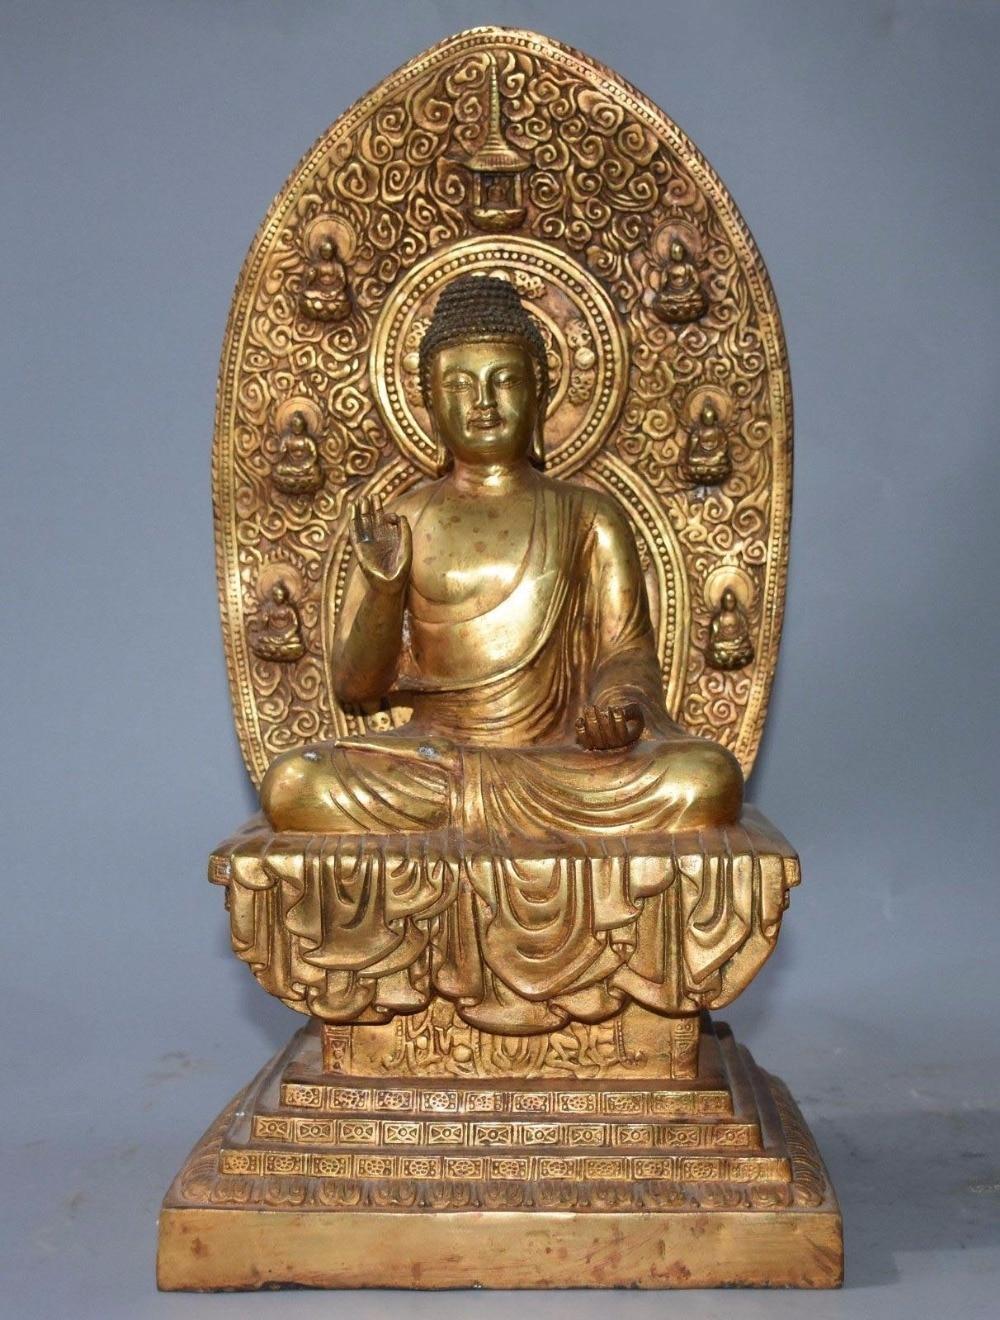 16 Tibet Buddhism Bronze Gilt Sakyamuni Shakyamuni Amoghasiddhi Buddha Statue16 Tibet Buddhism Bronze Gilt Sakyamuni Shakyamuni Amoghasiddhi Buddha Statue